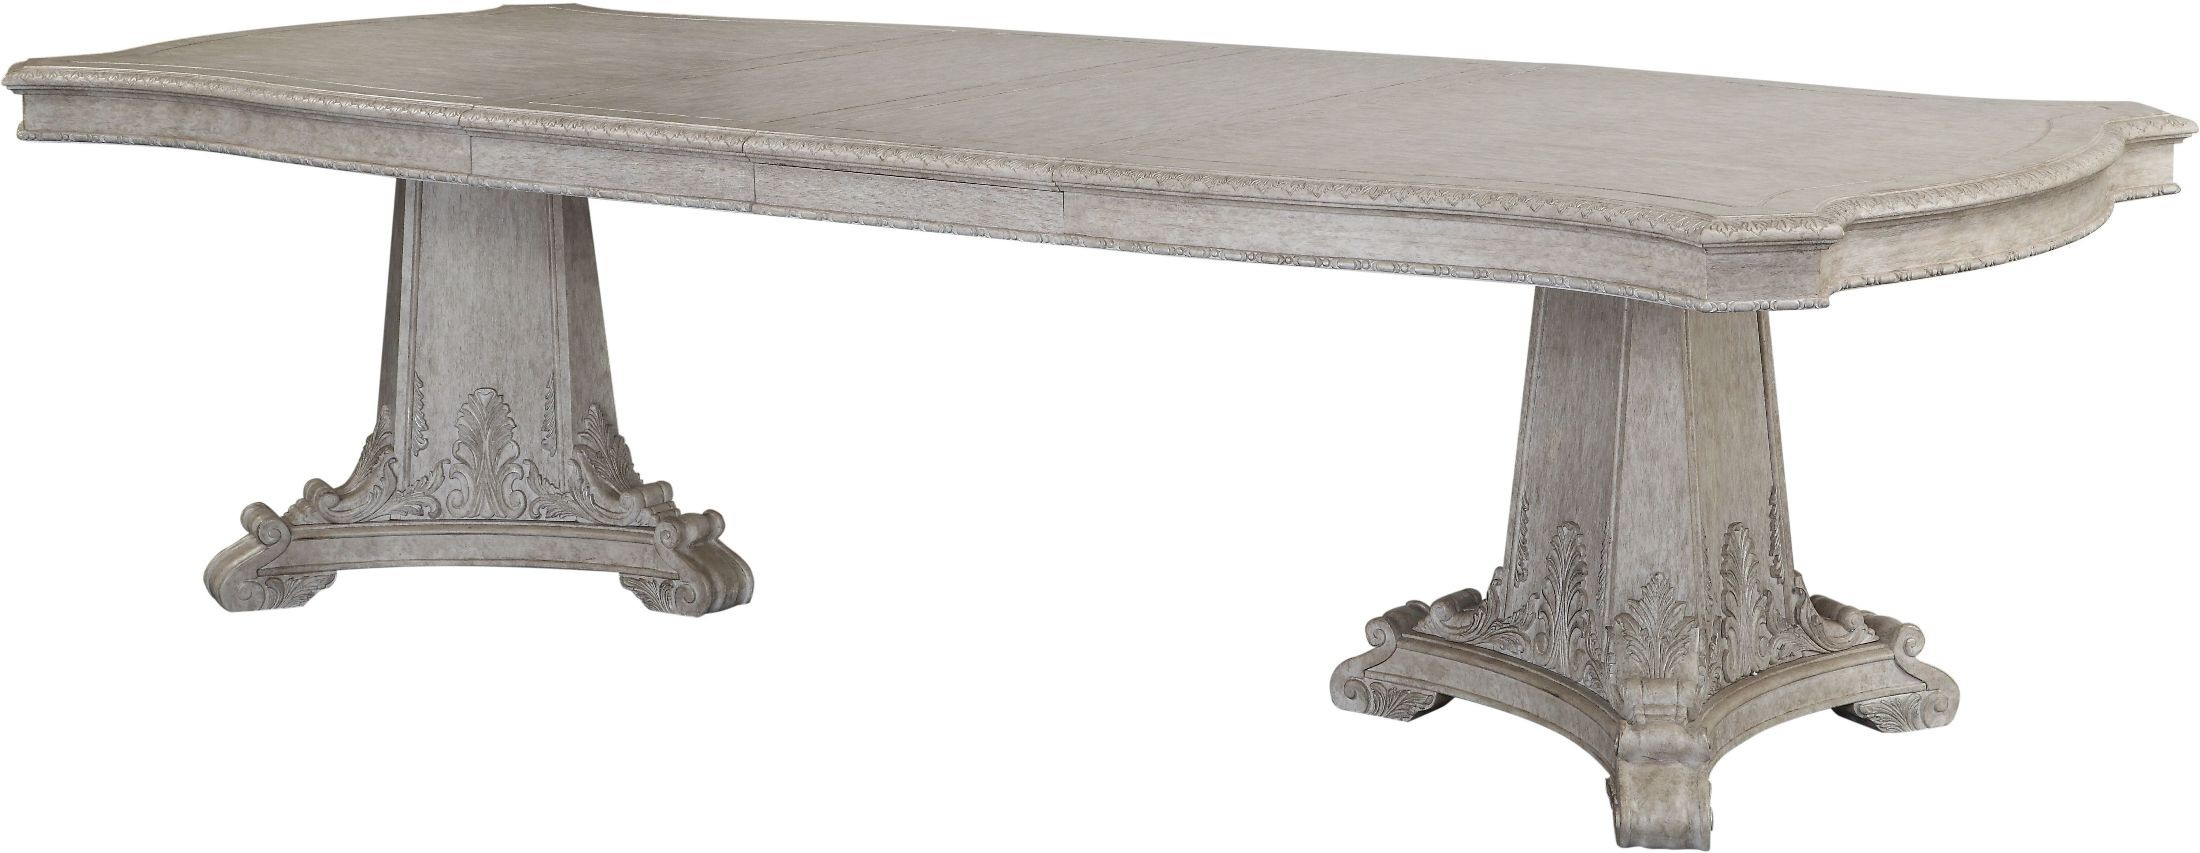 renaissance rectangular double pedestal dining table from art coleman furniture. Black Bedroom Furniture Sets. Home Design Ideas